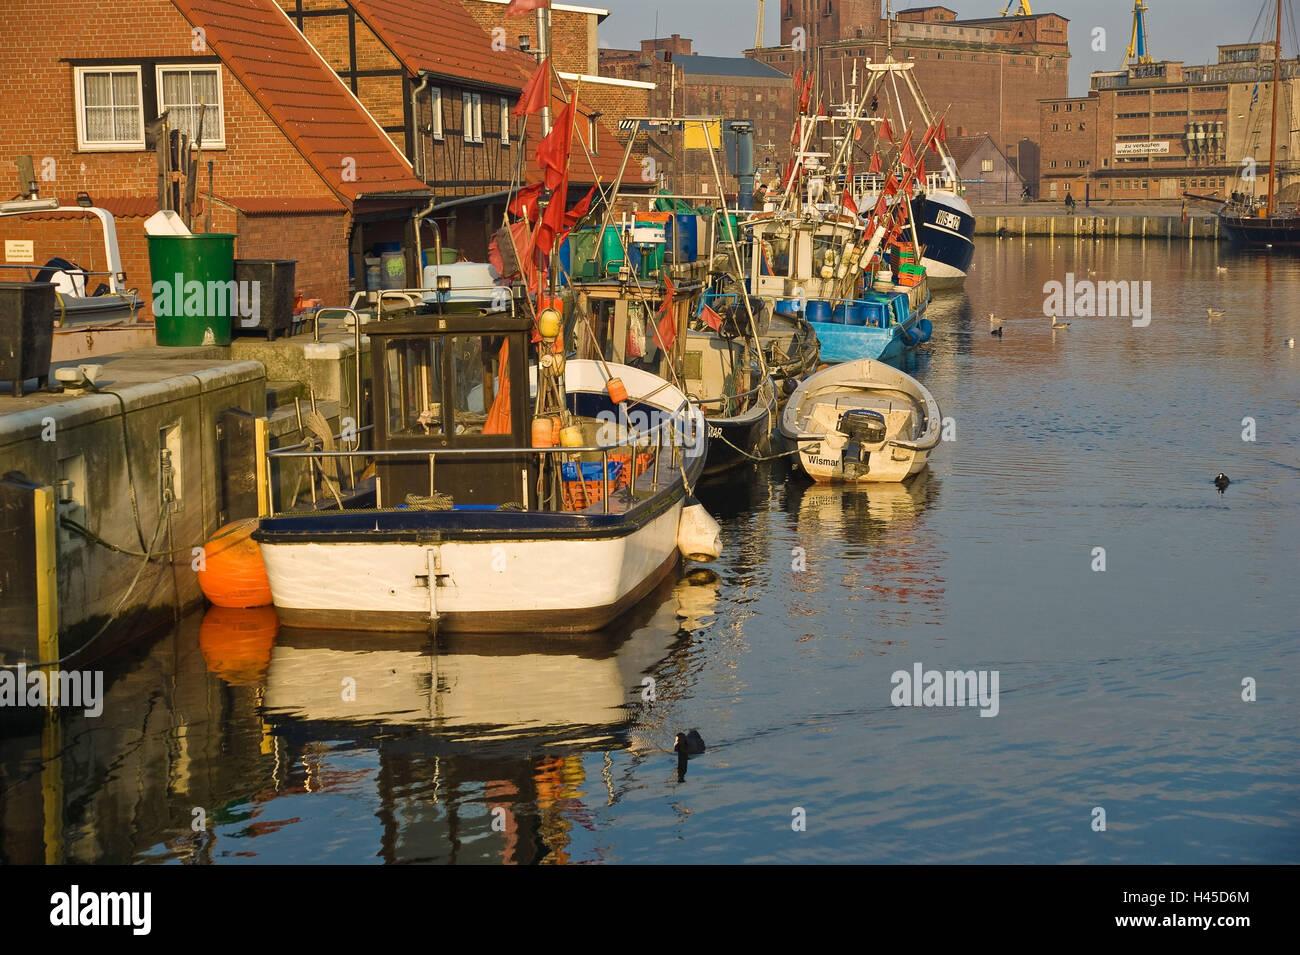 Germany, Mecklenburg-West Pomerania, Wismar, harbour, boots, Stock Photo